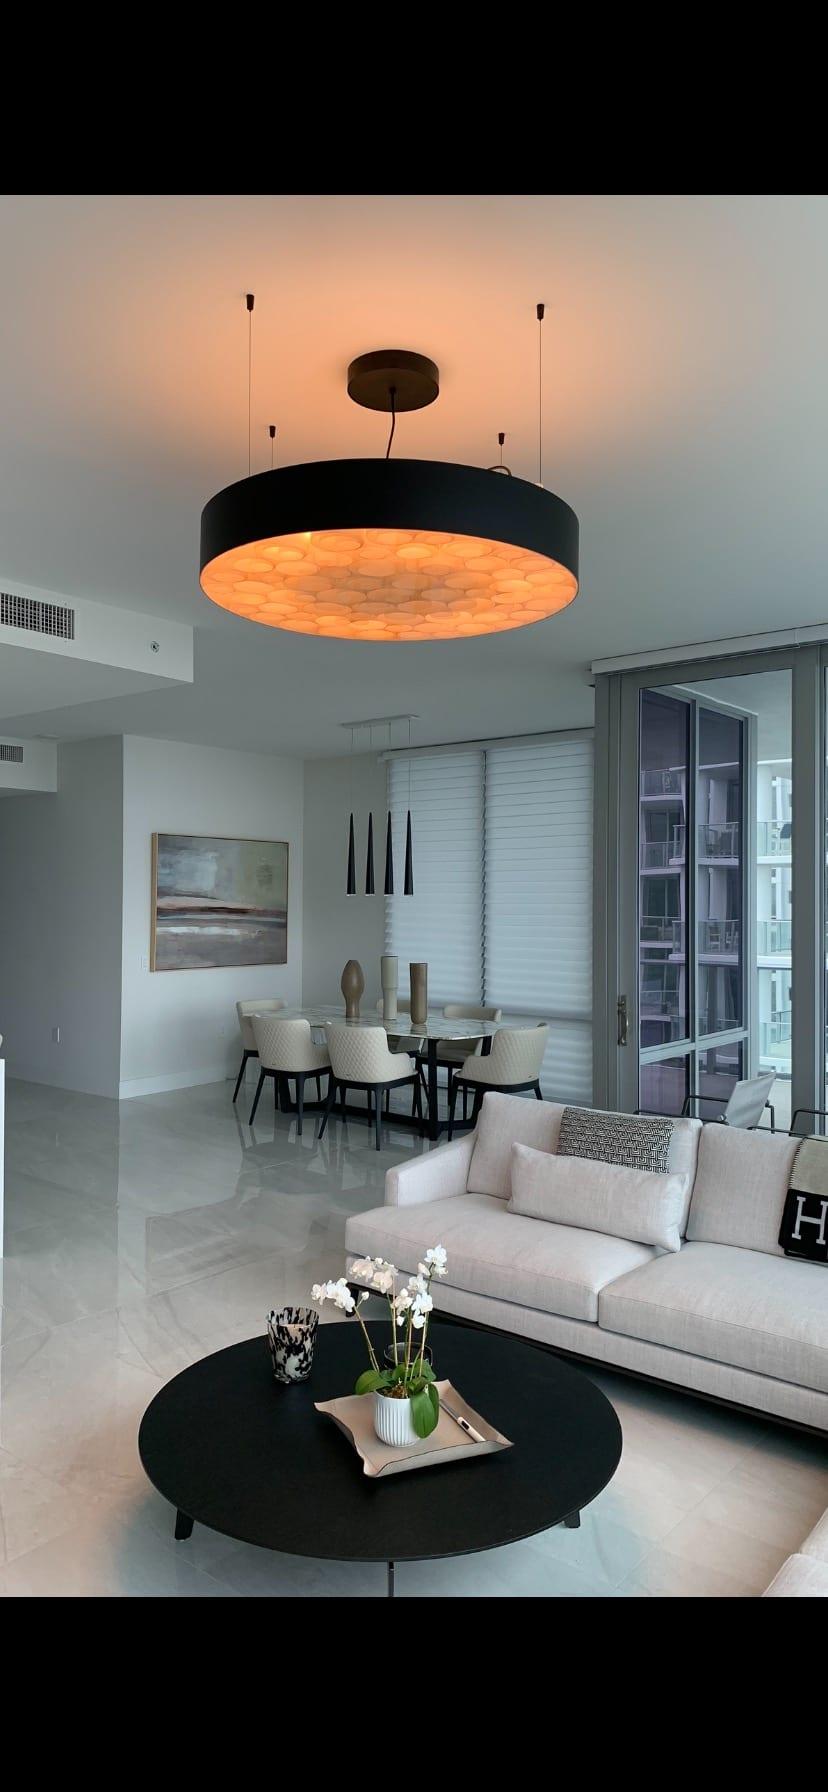 Living Room Decorative Custom Lighting Fixtures